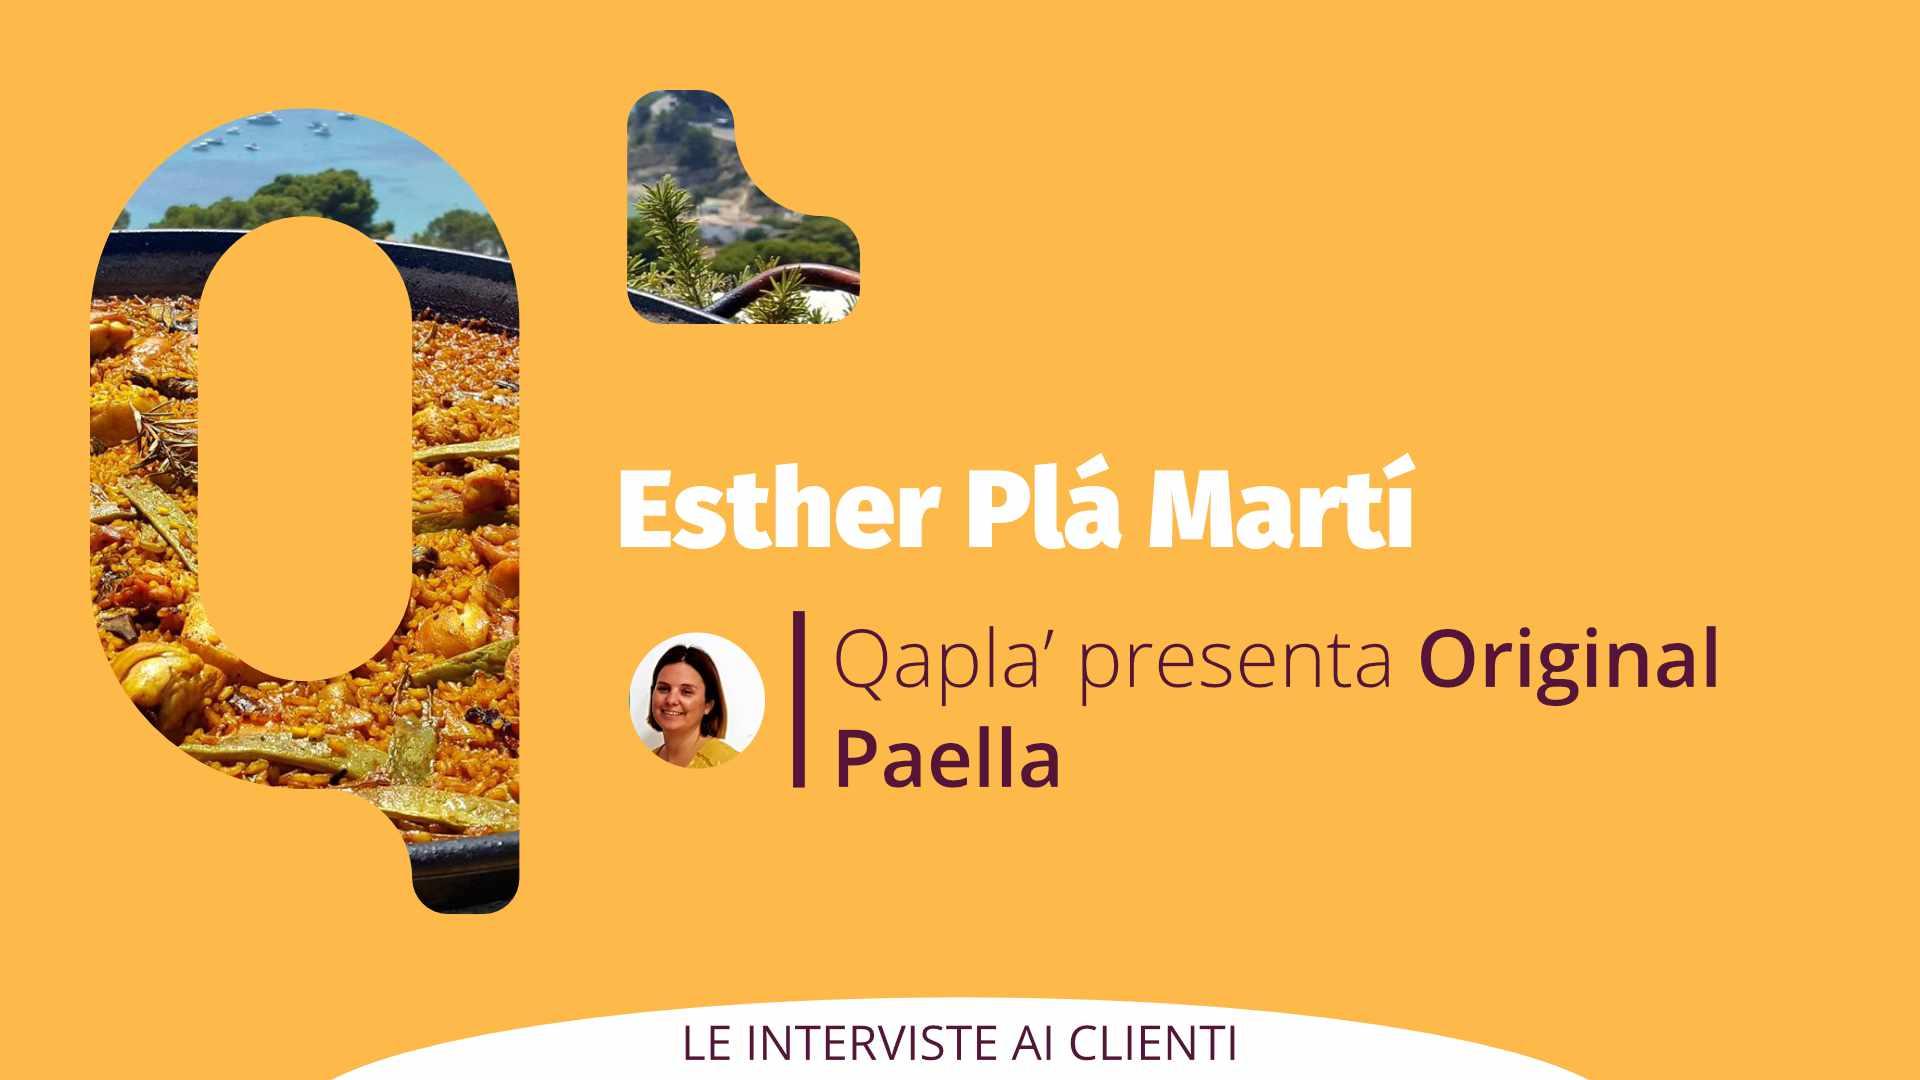 Qapla' presenta Original Paella: Intervista a Esther Plá Martí